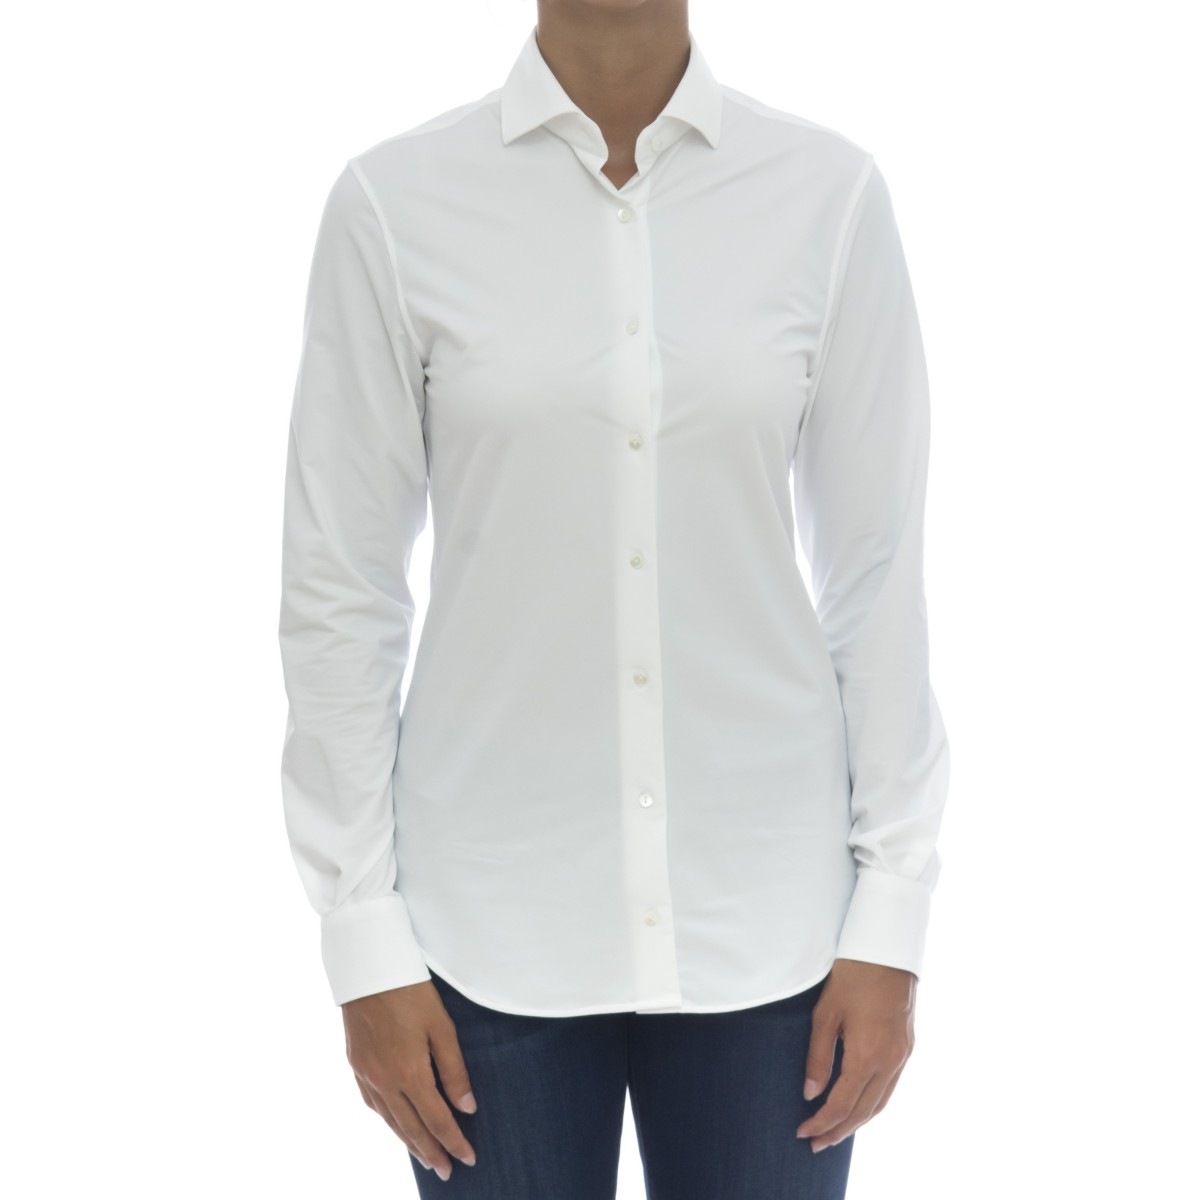 Camicia donna - Pina active 15460 camicia active unio